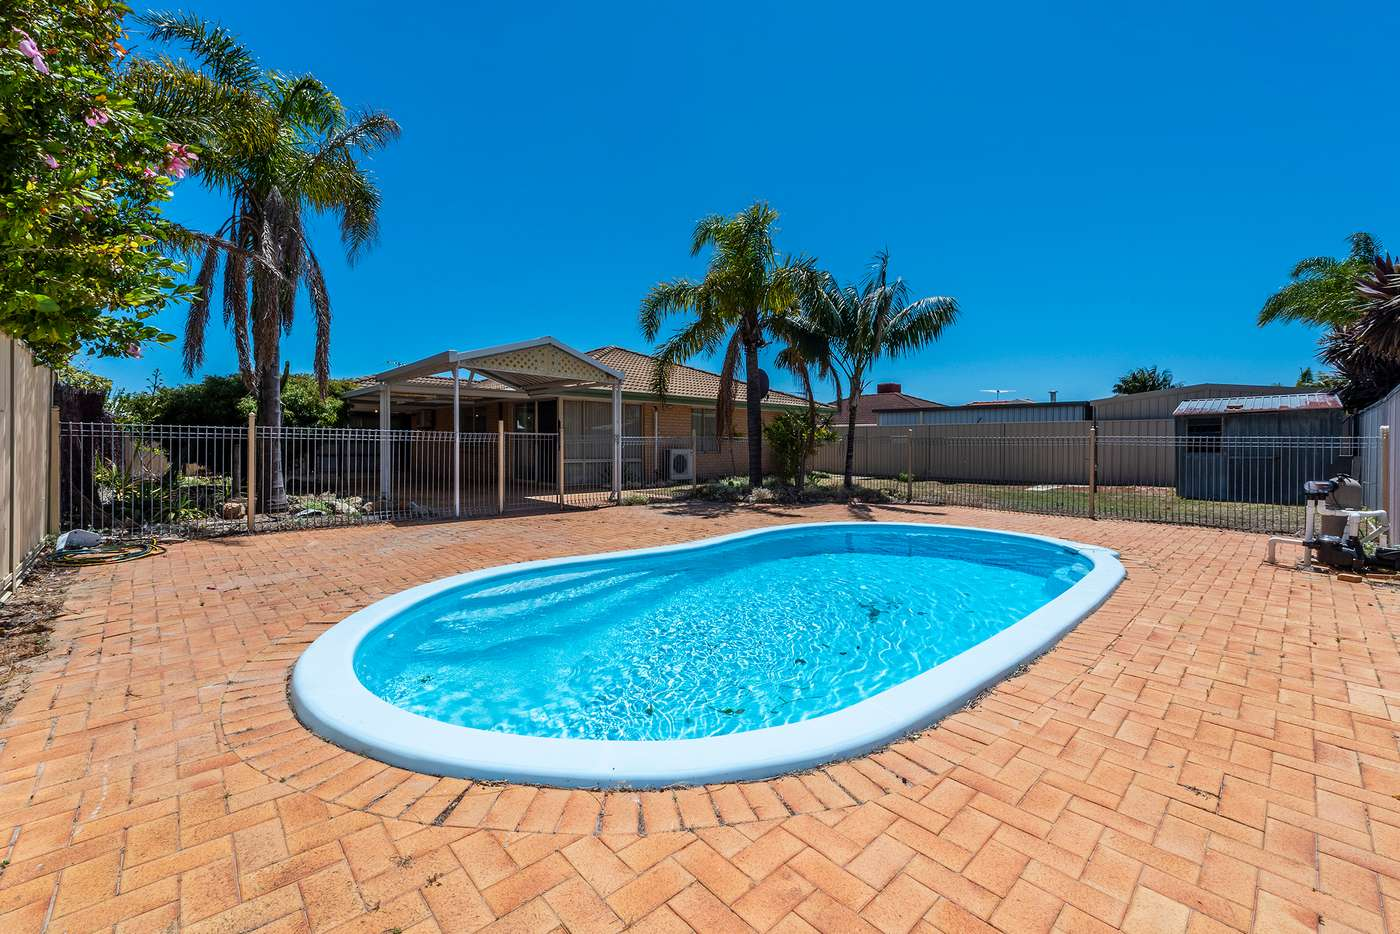 Main view of Homely house listing, 18 Resolution Drive, Waikiki WA 6169